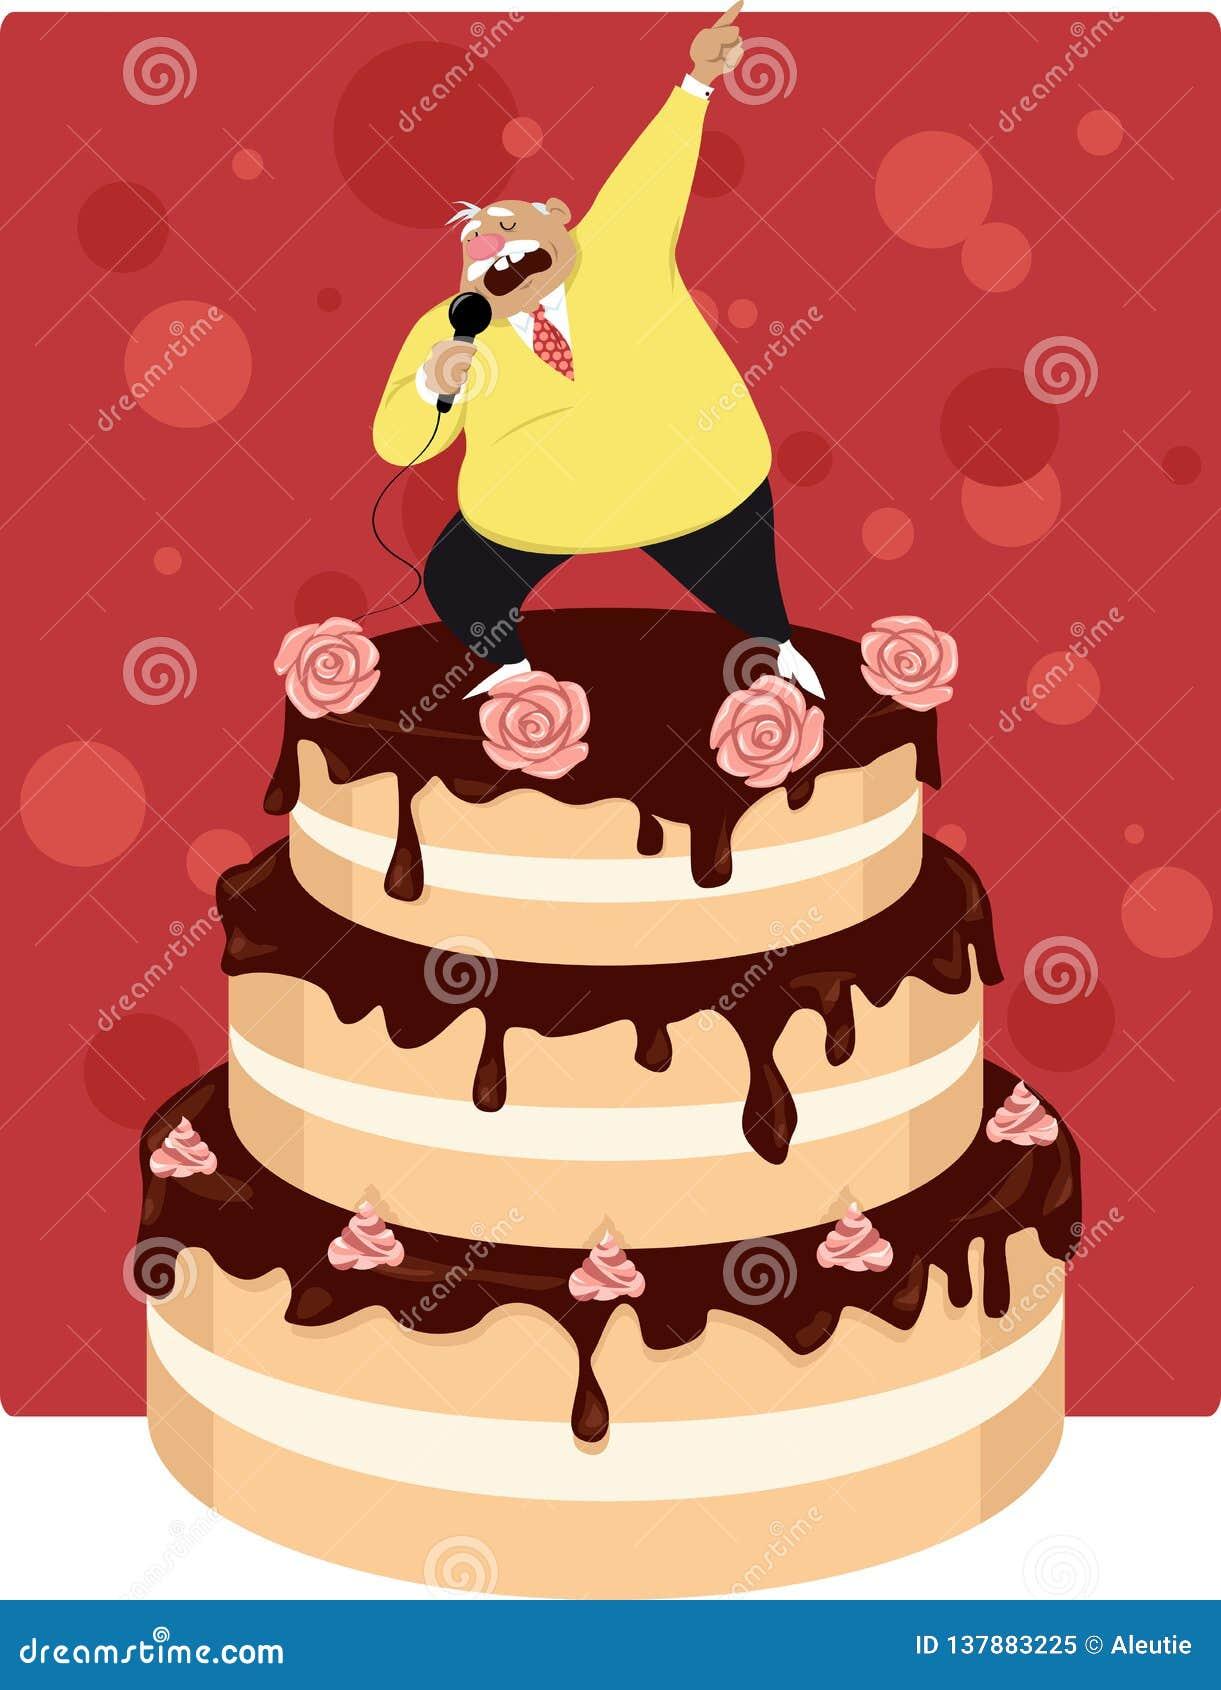 Old Man Birthday Cake Stock Illustrations 82 Old Man Birthday Cake Stock Illustrations Vectors Clipart Dreamstime